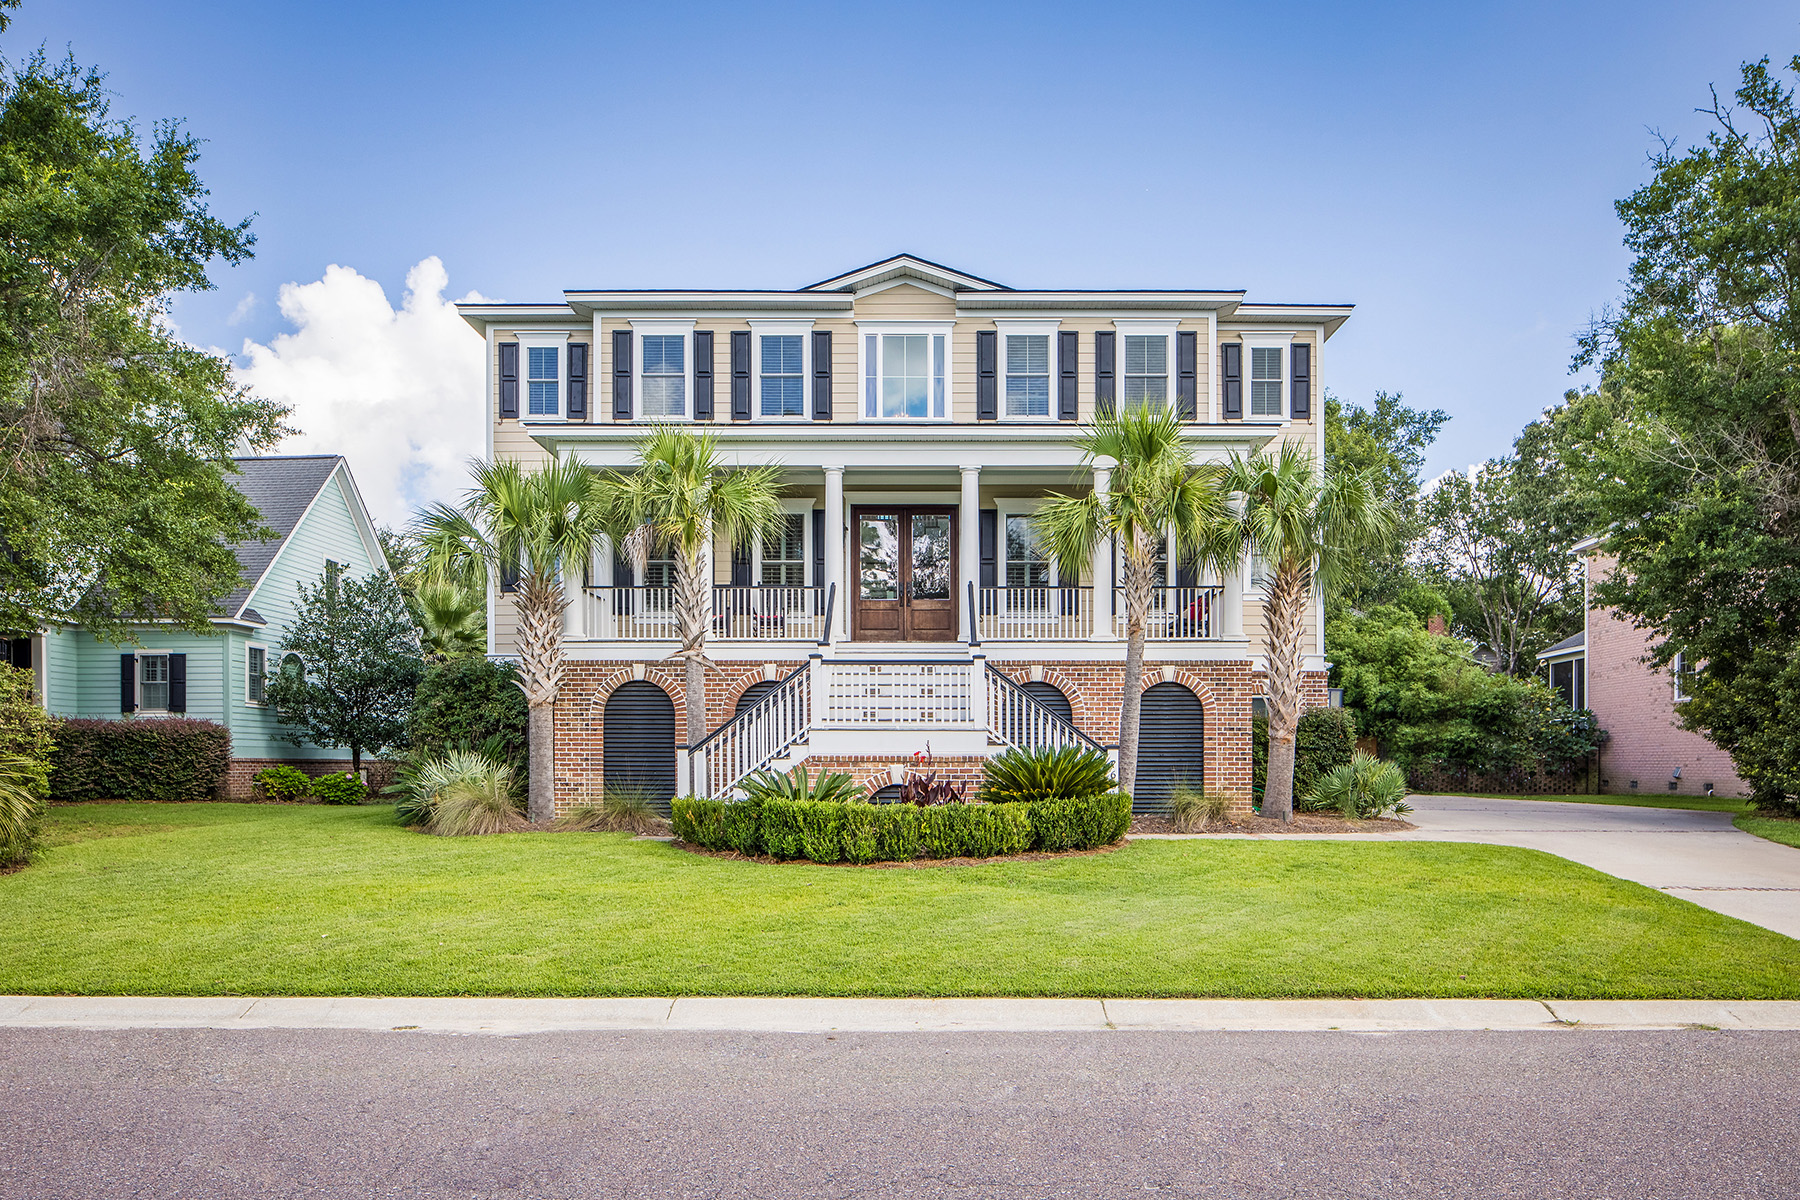 Single Family Home for Sale at 768 Whispering Marsh Drive Charleston, South Carolina, 29412 United States